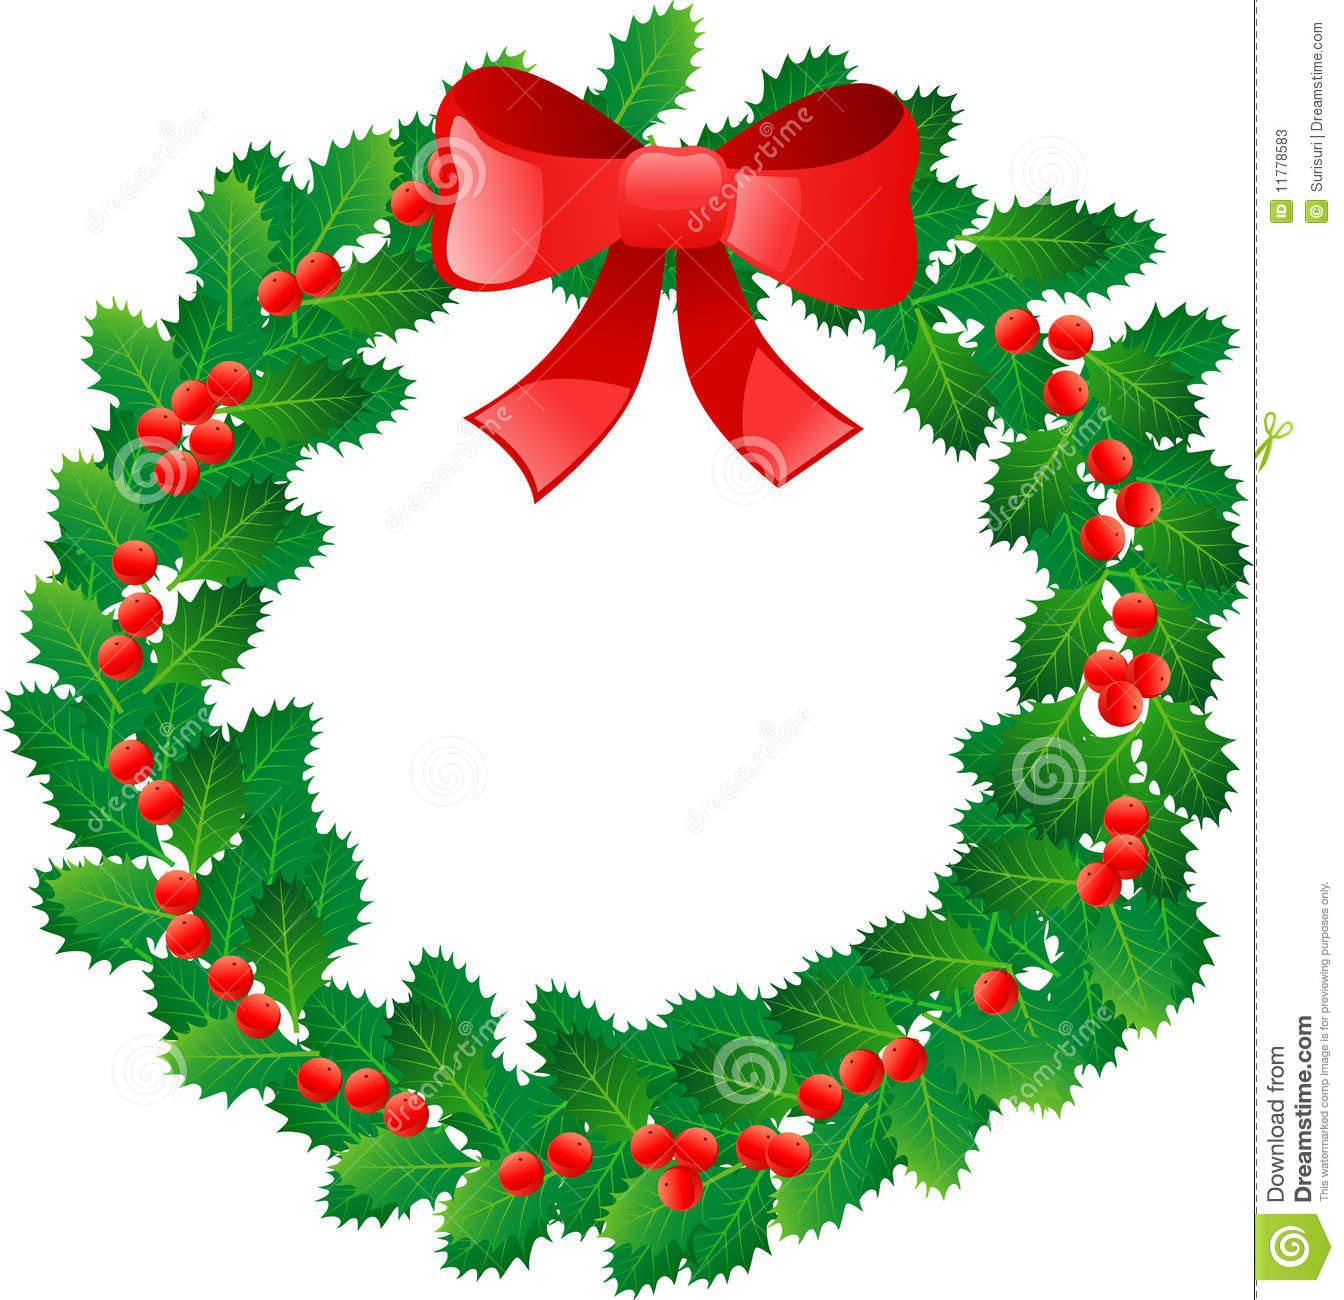 Animated Holiday Wreaths